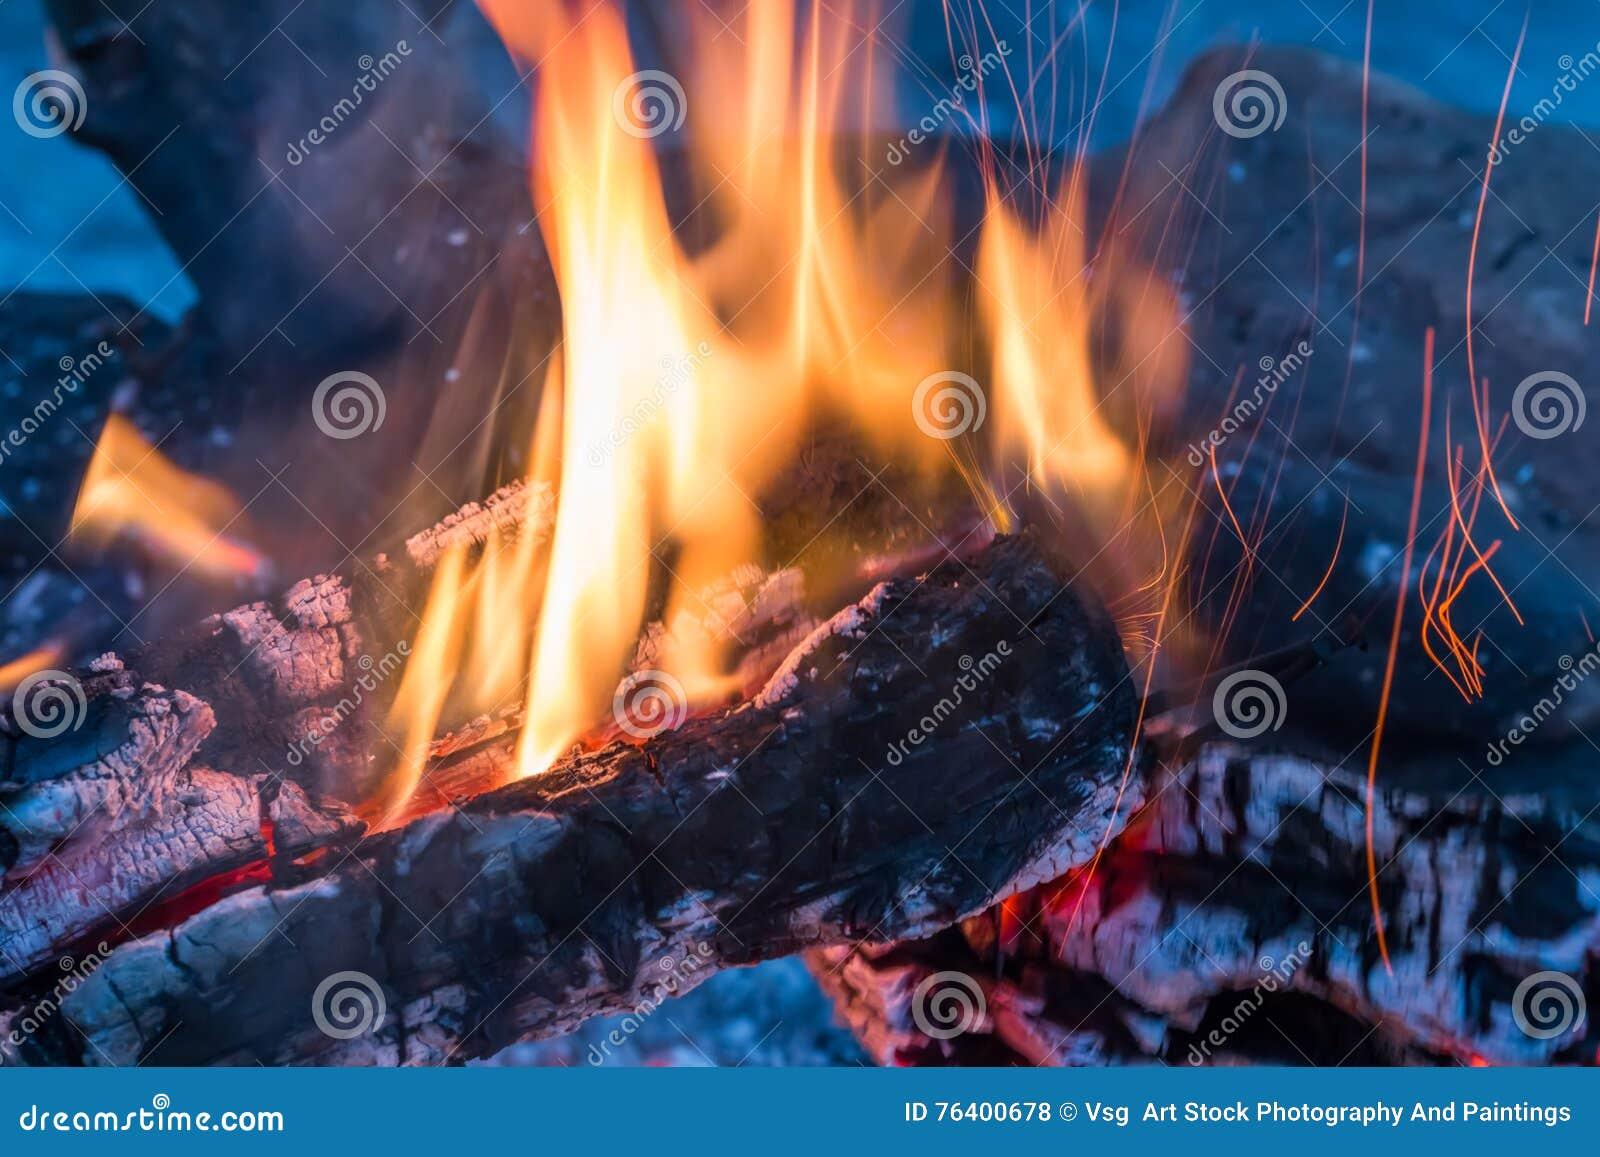 Closeup Of Warm Glowing Embers In Fireplace Stock Image ...